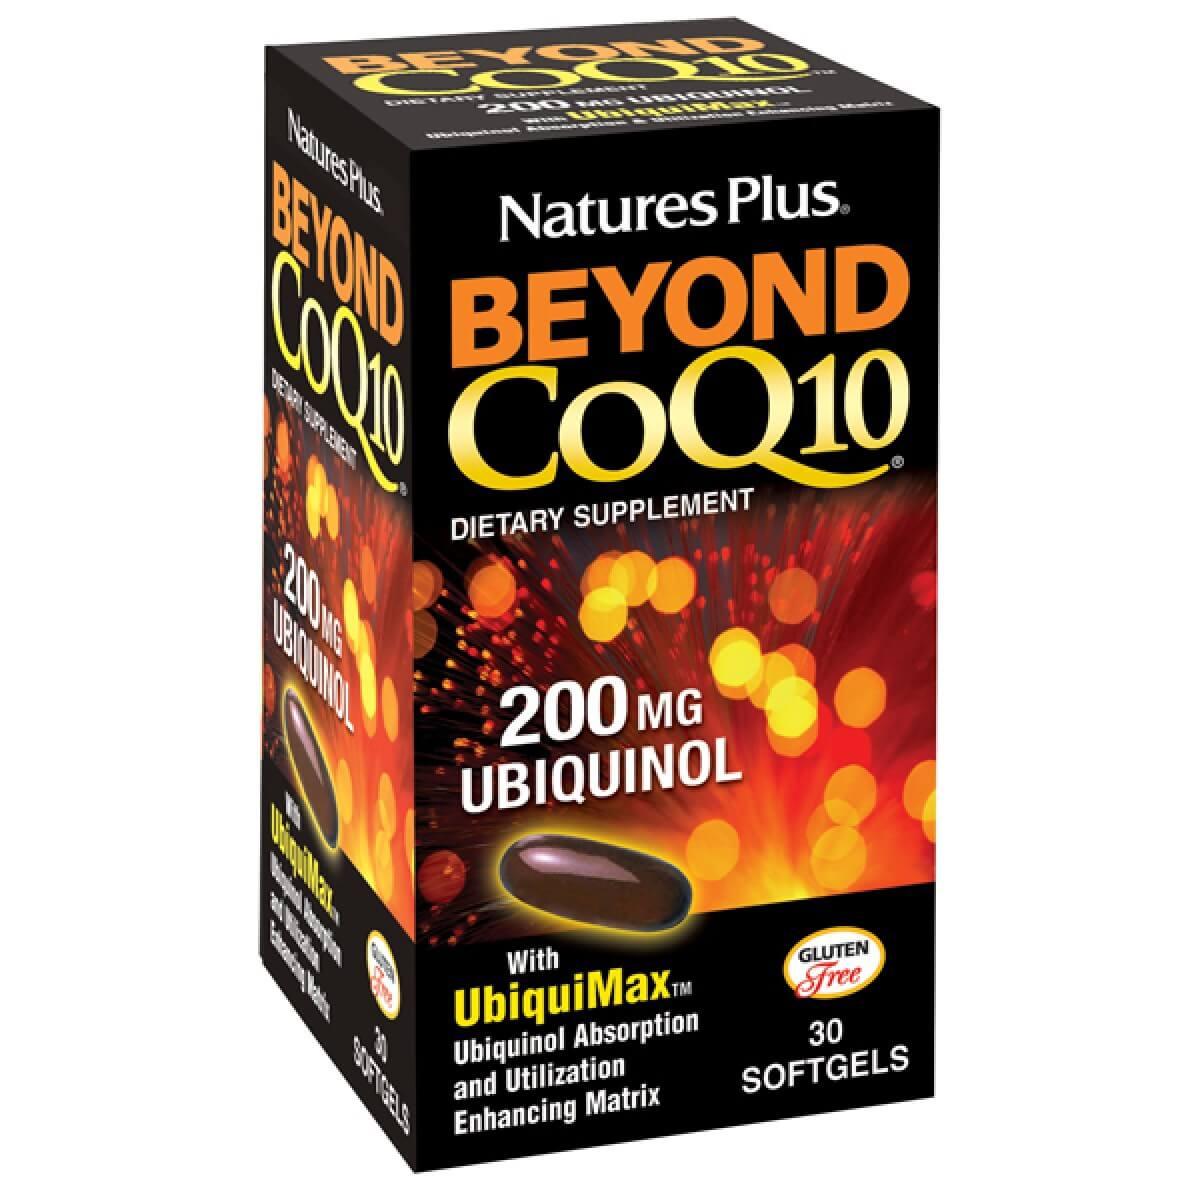 Natures Plus Beyond CoQ10 200mg Συμπλήρωμα Διατροφήςγια Καλύτερη Απορρόφηση &Βιοδιαθεσιμότητα 30 Softgels